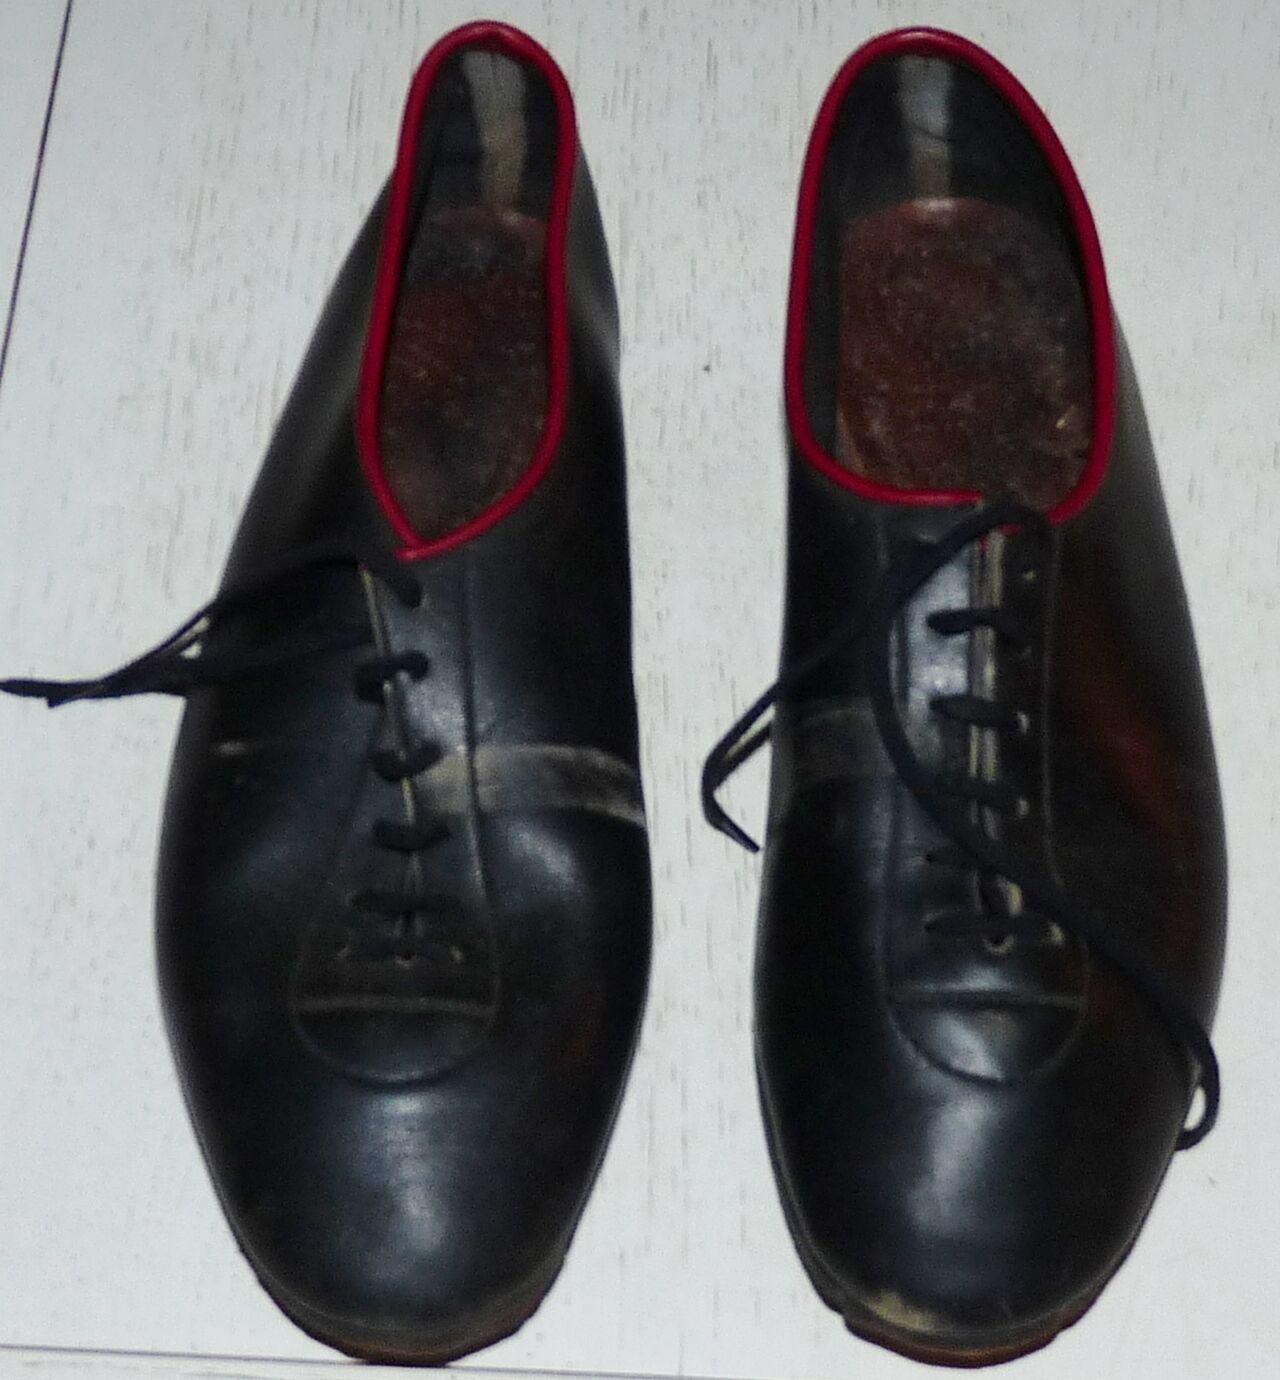 RARE VINTAGE shoes CYCLISME CICLISMO 1960 60's AVEC CALE-PIEDS CRITERIUM